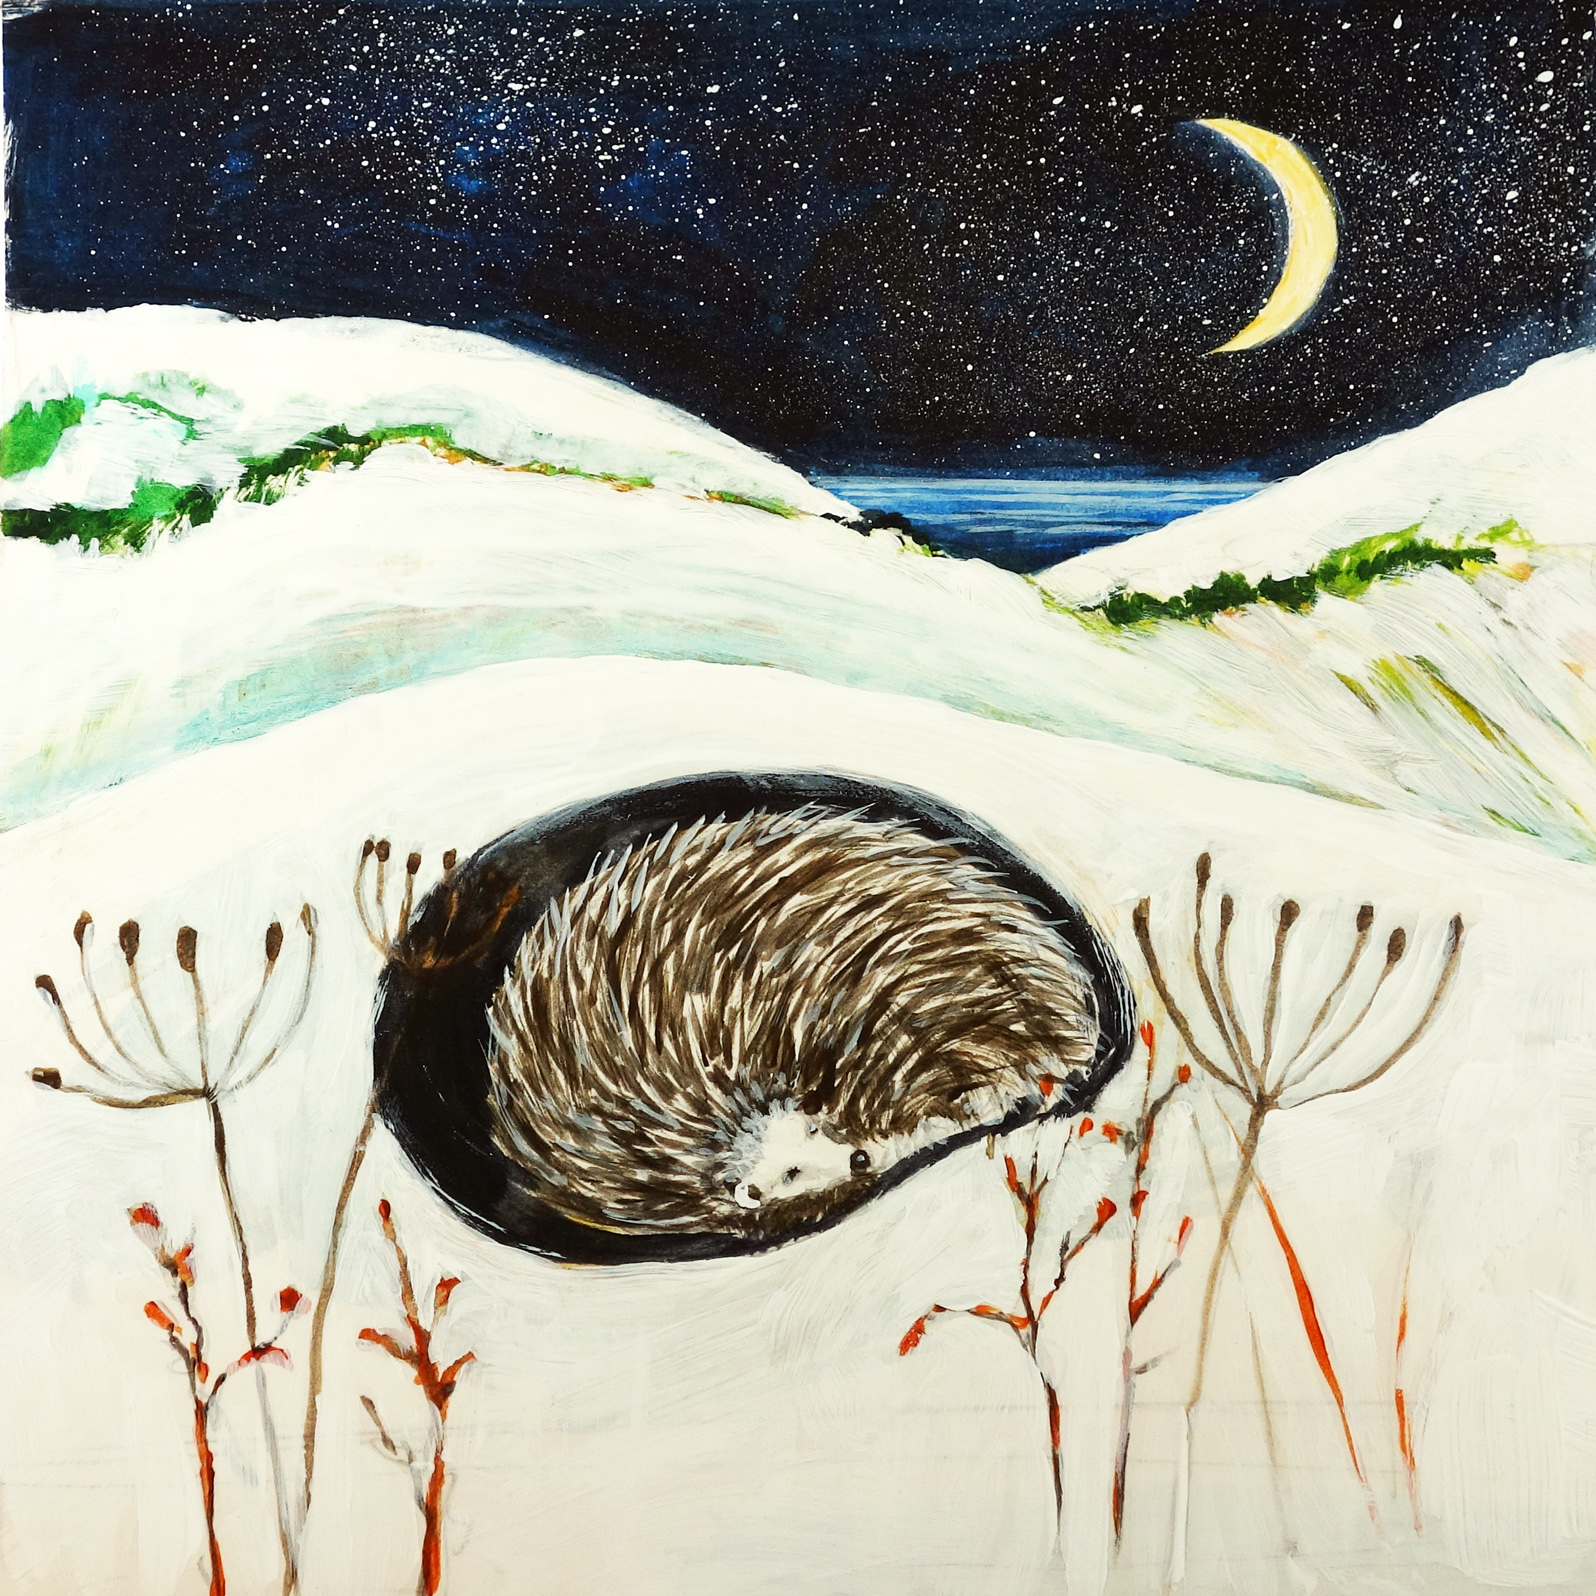 WINTER HEDGEHOG by Fran Slade